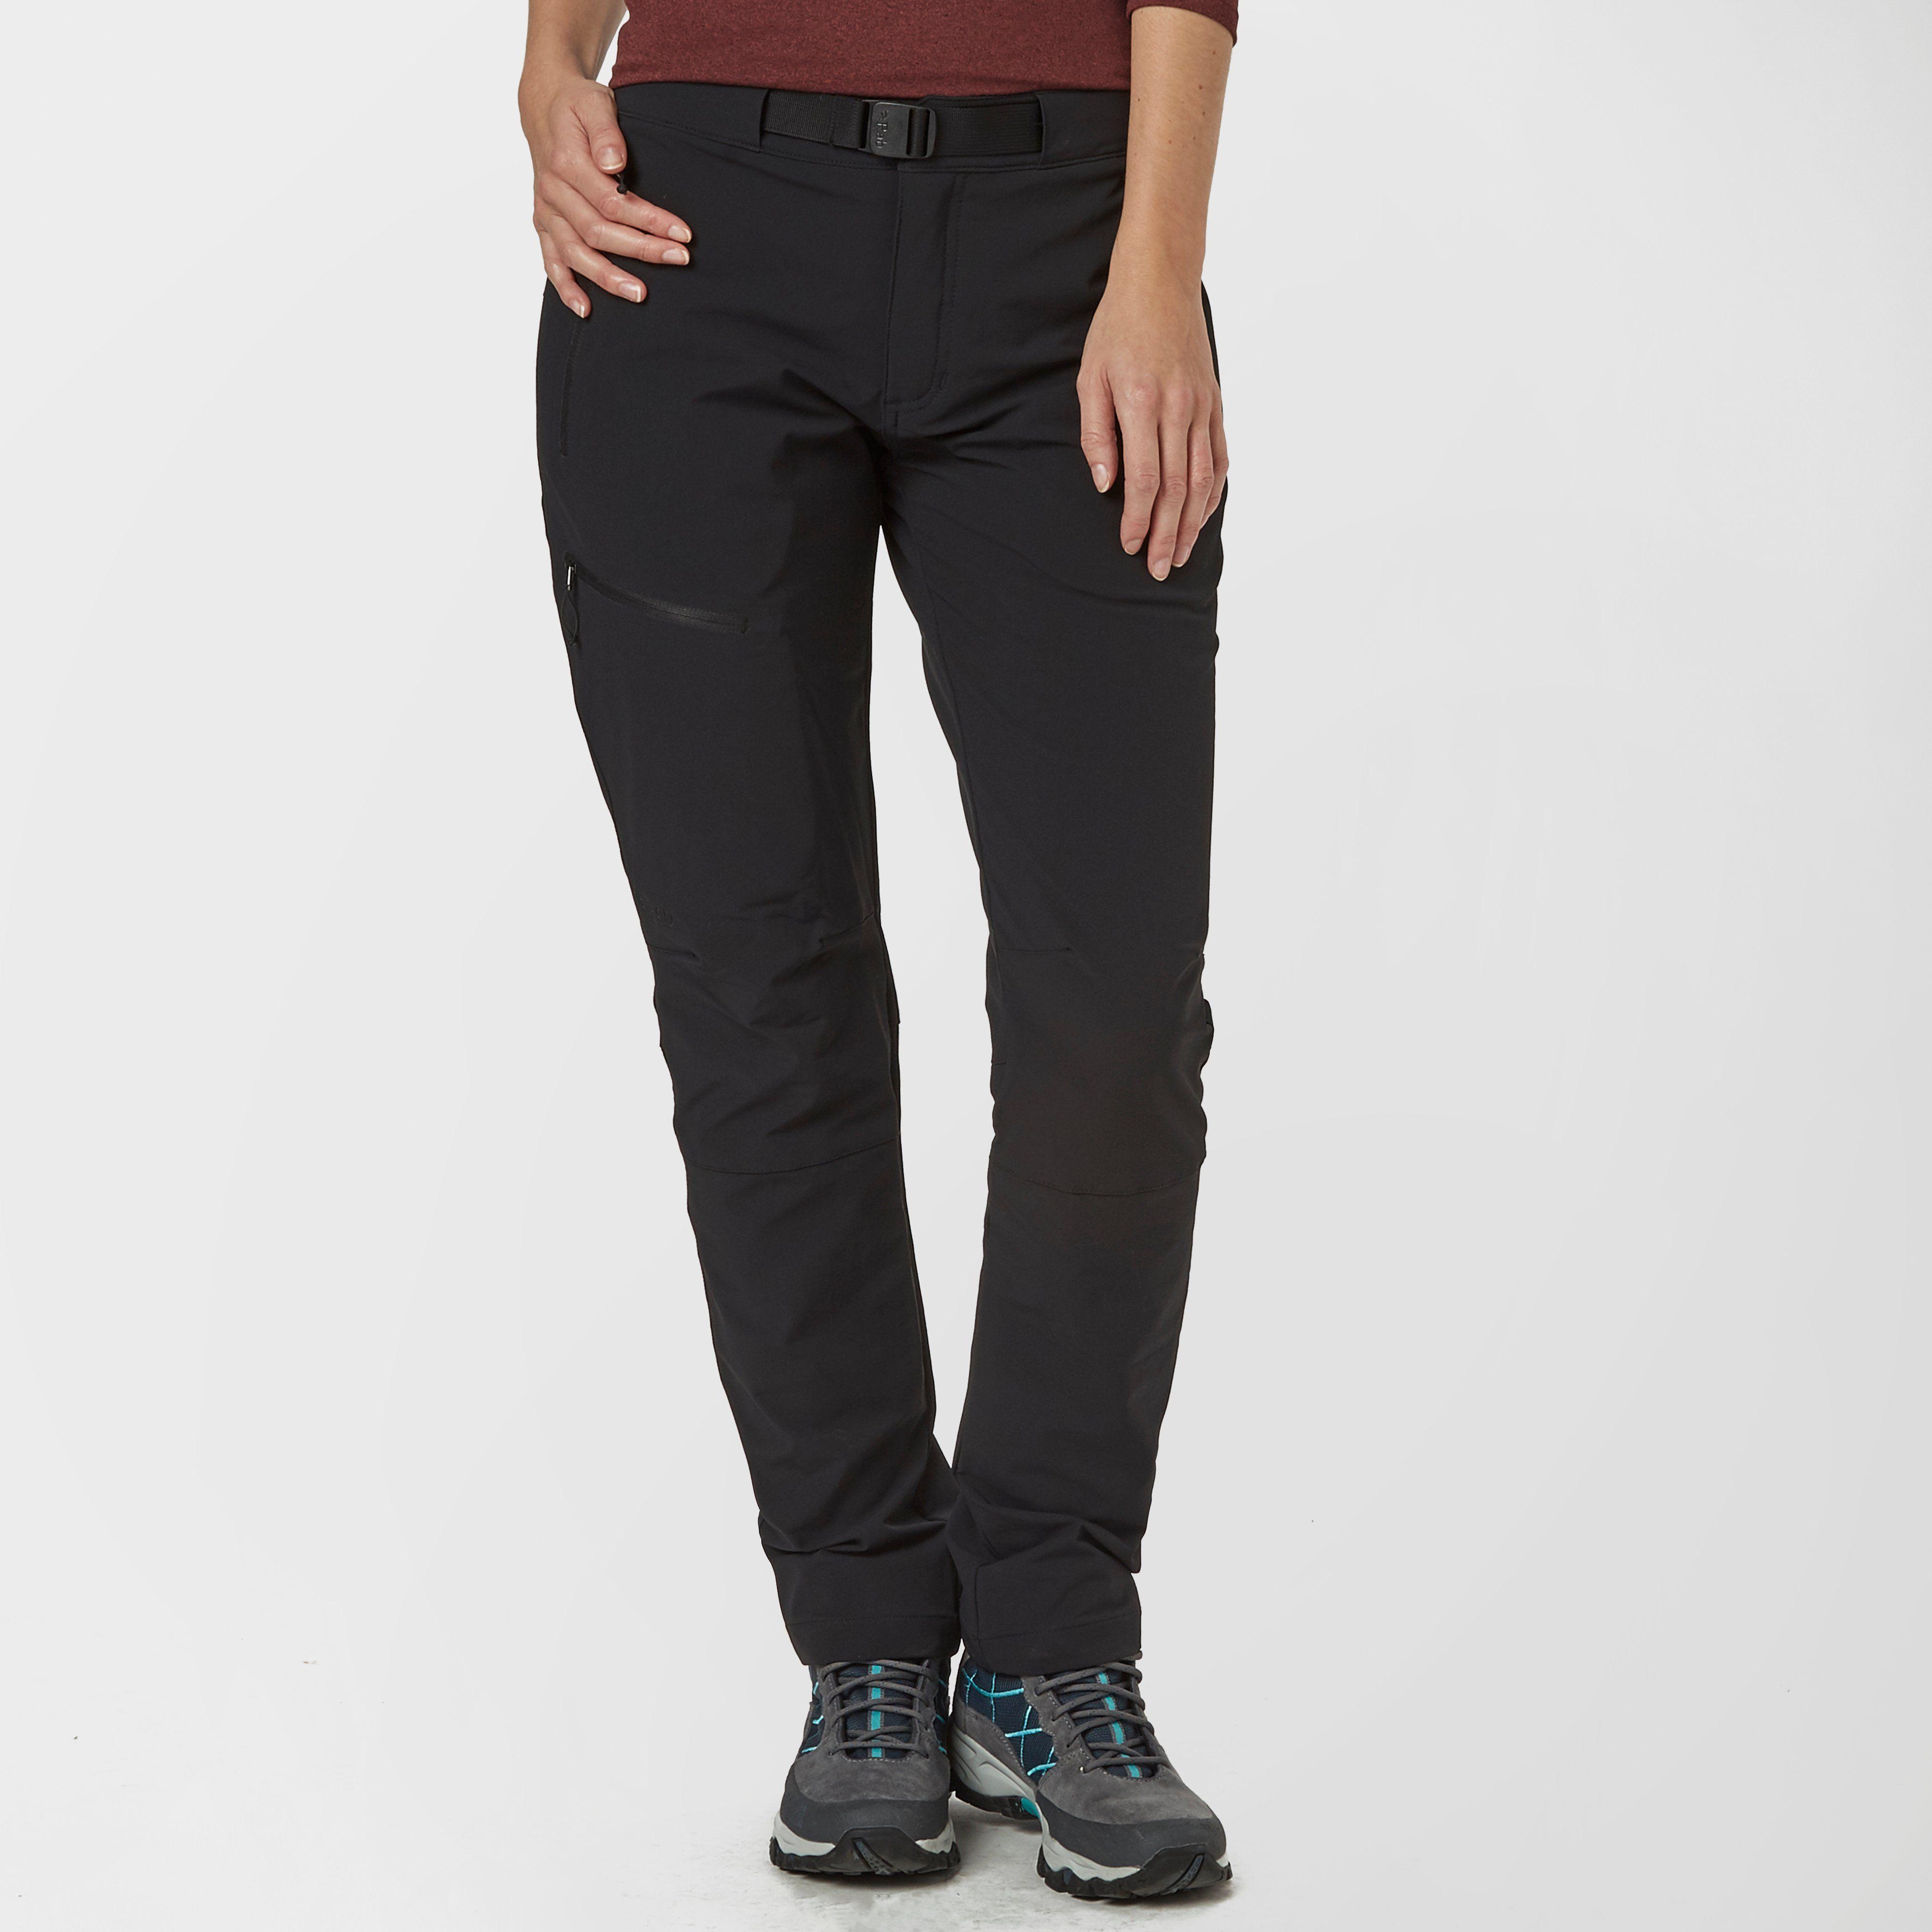 RAB Women's Vector Softshell Pants